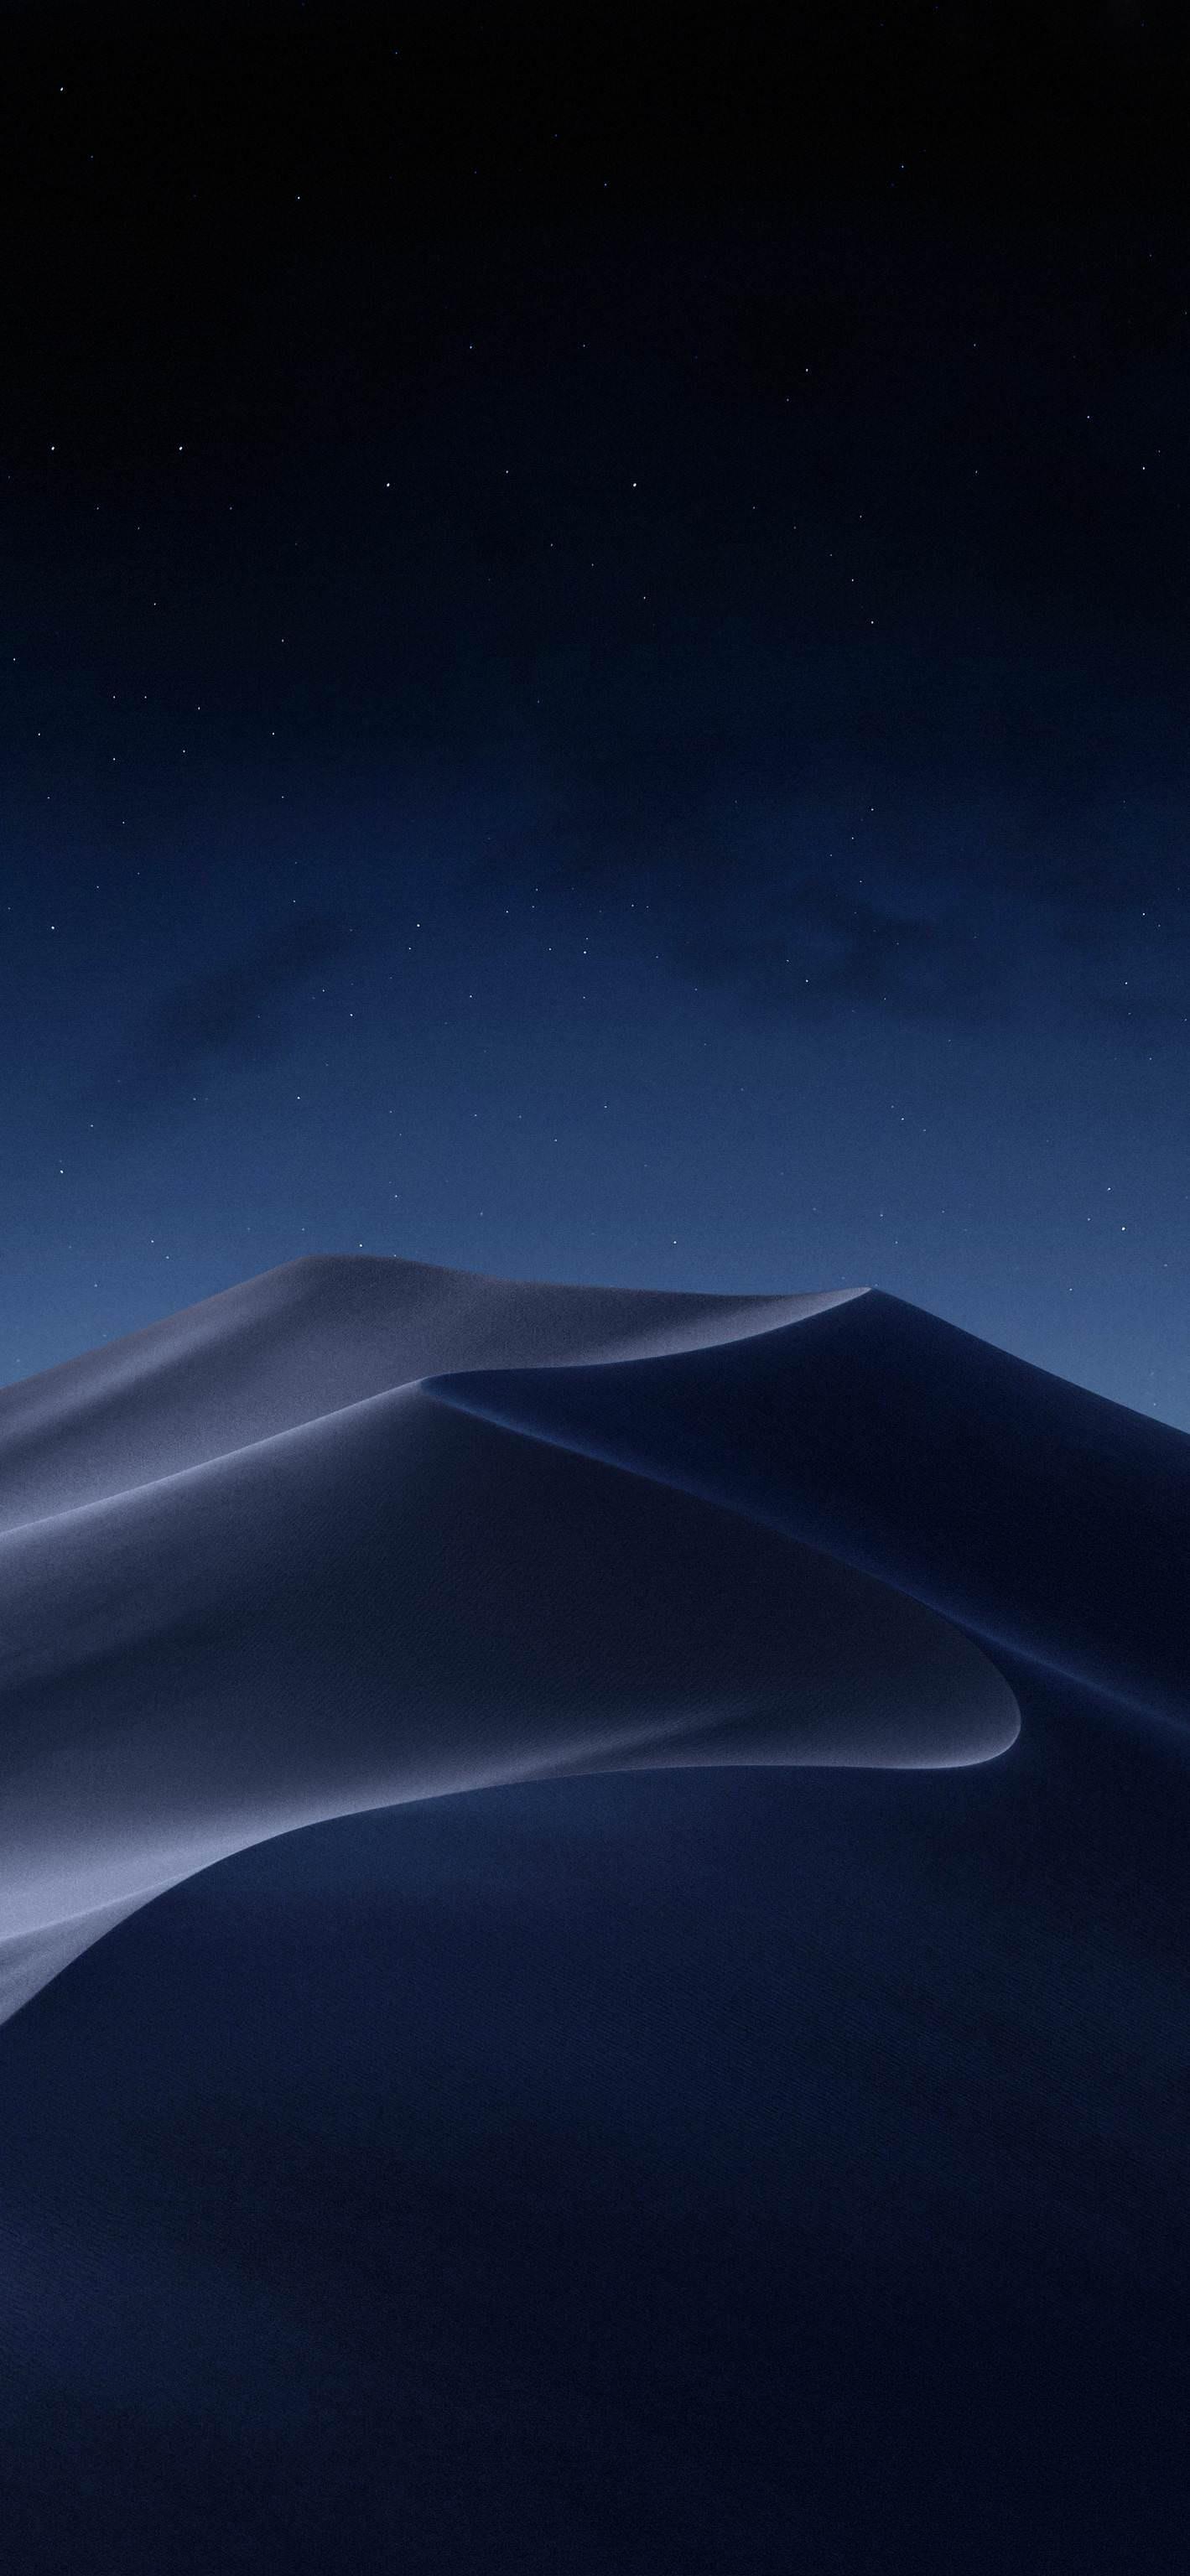 Macos catalina wallpaper for iphone. Macos Mojave Dark Wallpaper For Iphone Or Android Iwallpaper